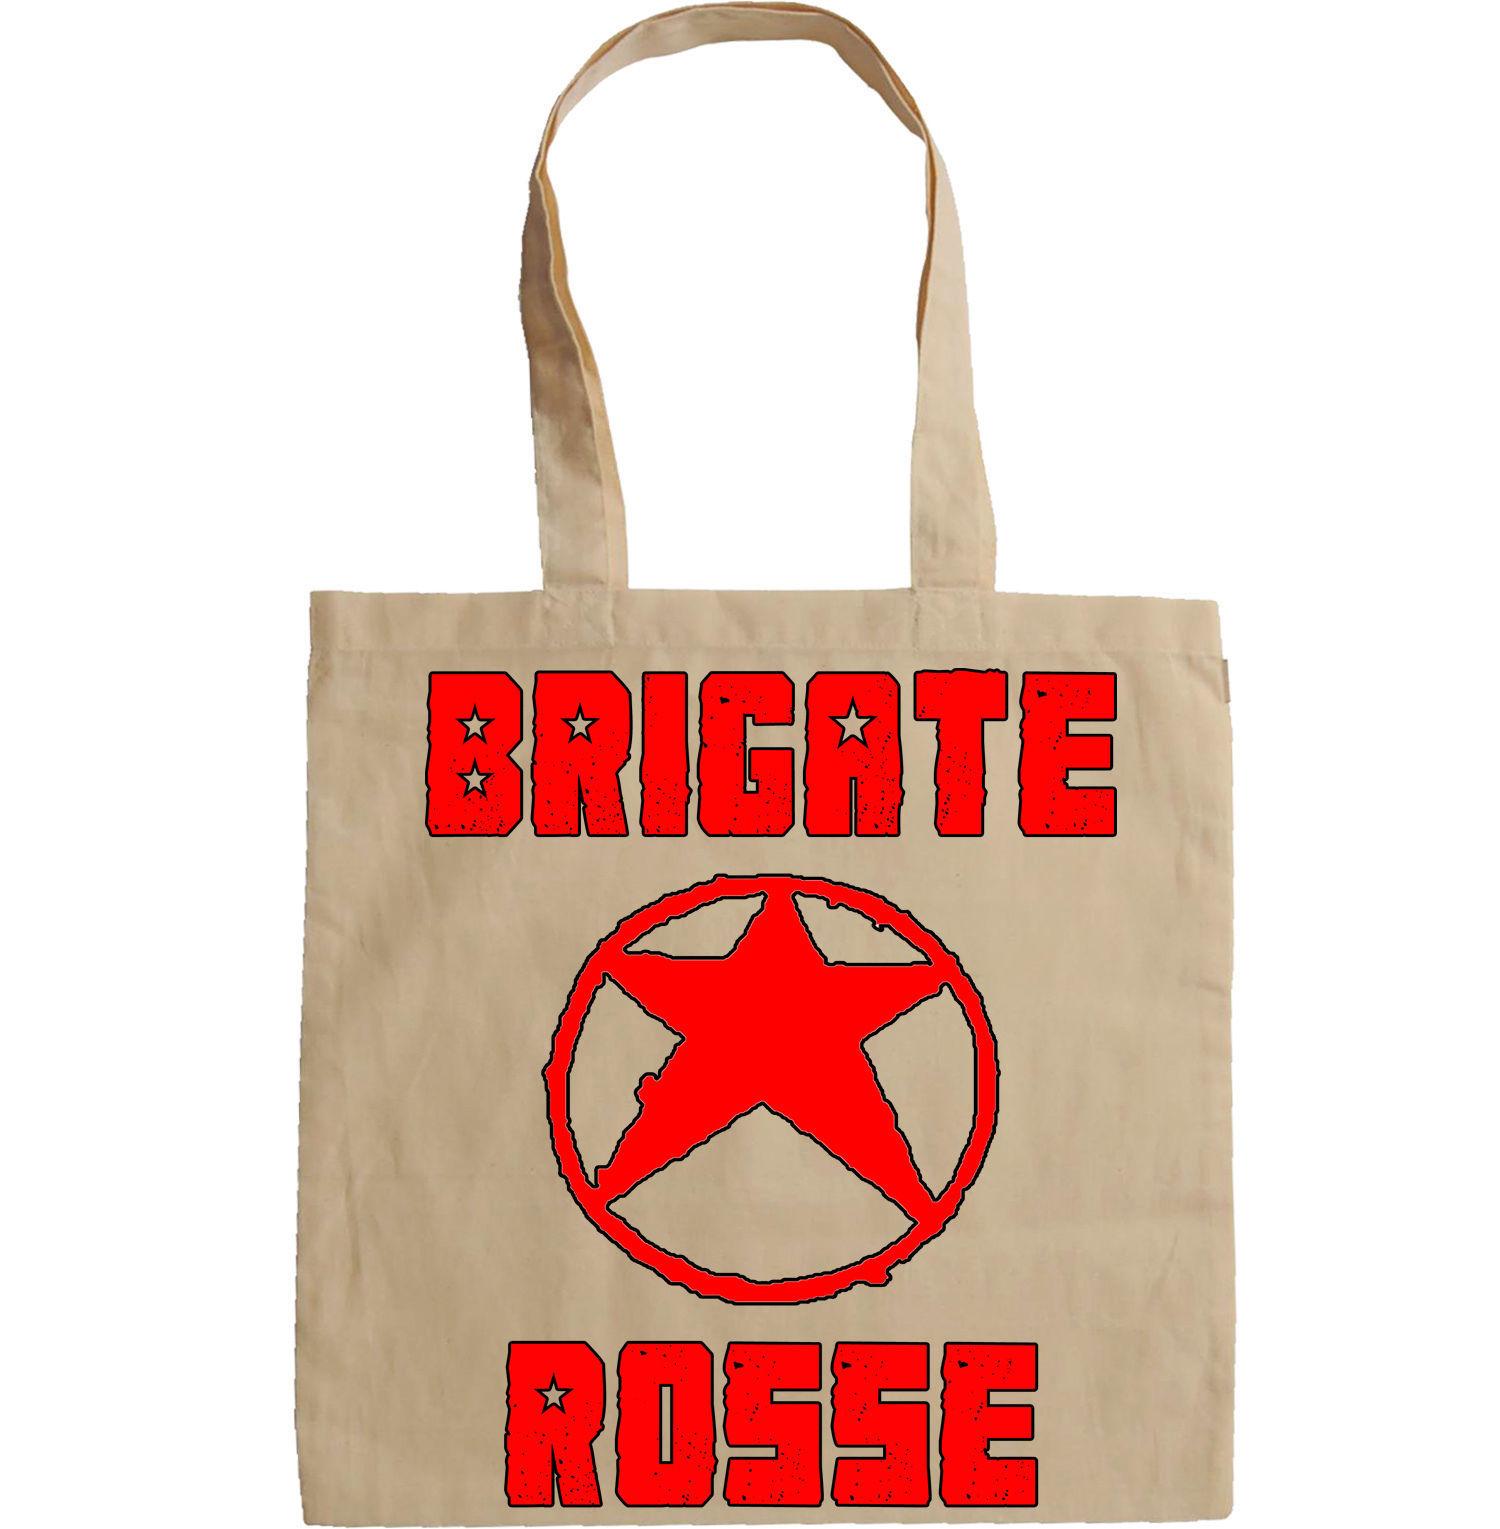 BRIGATE ROSSE COMMUNIST MOVEMENT - NEW AMAZING GRAPHIC HAND BAG/TOTE BAG